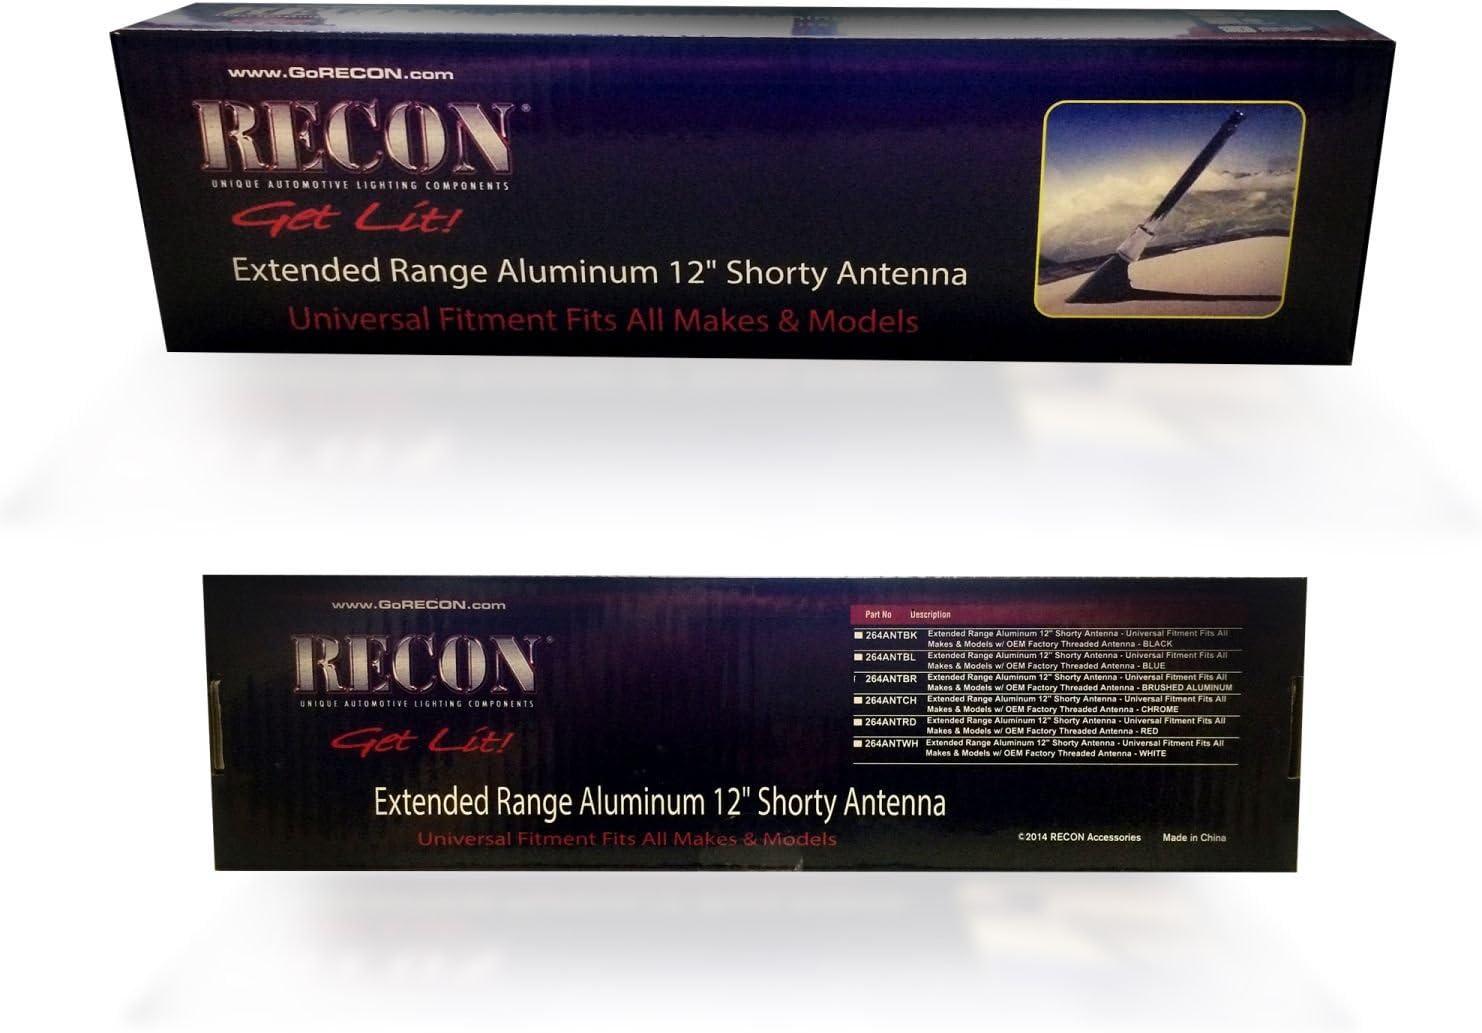 Recon 264Antbk Black 12 Antenna Mast